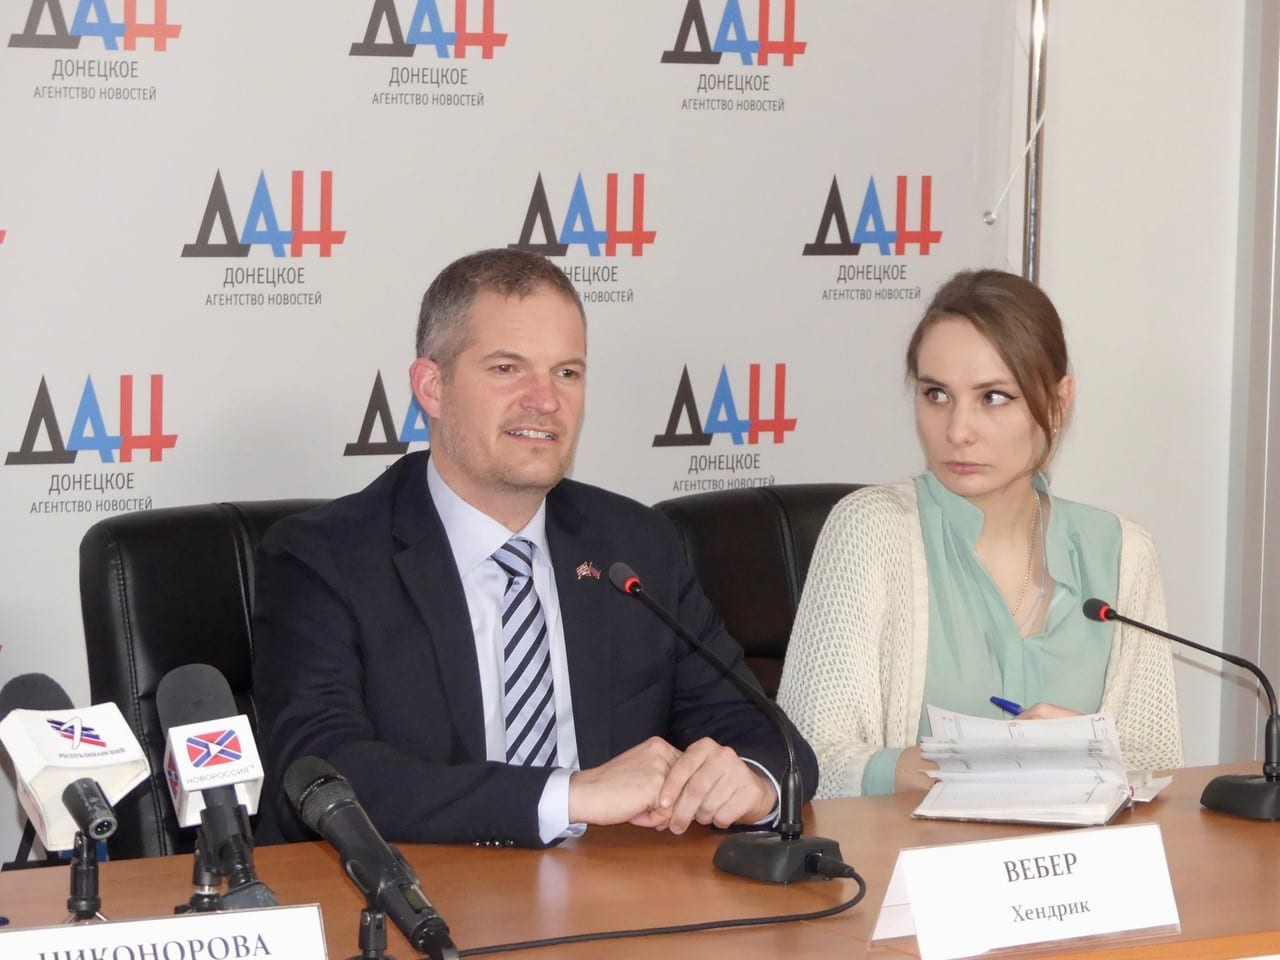 People Diplomacy Norway, Hendrik Weber, Donetsk, Herland Report